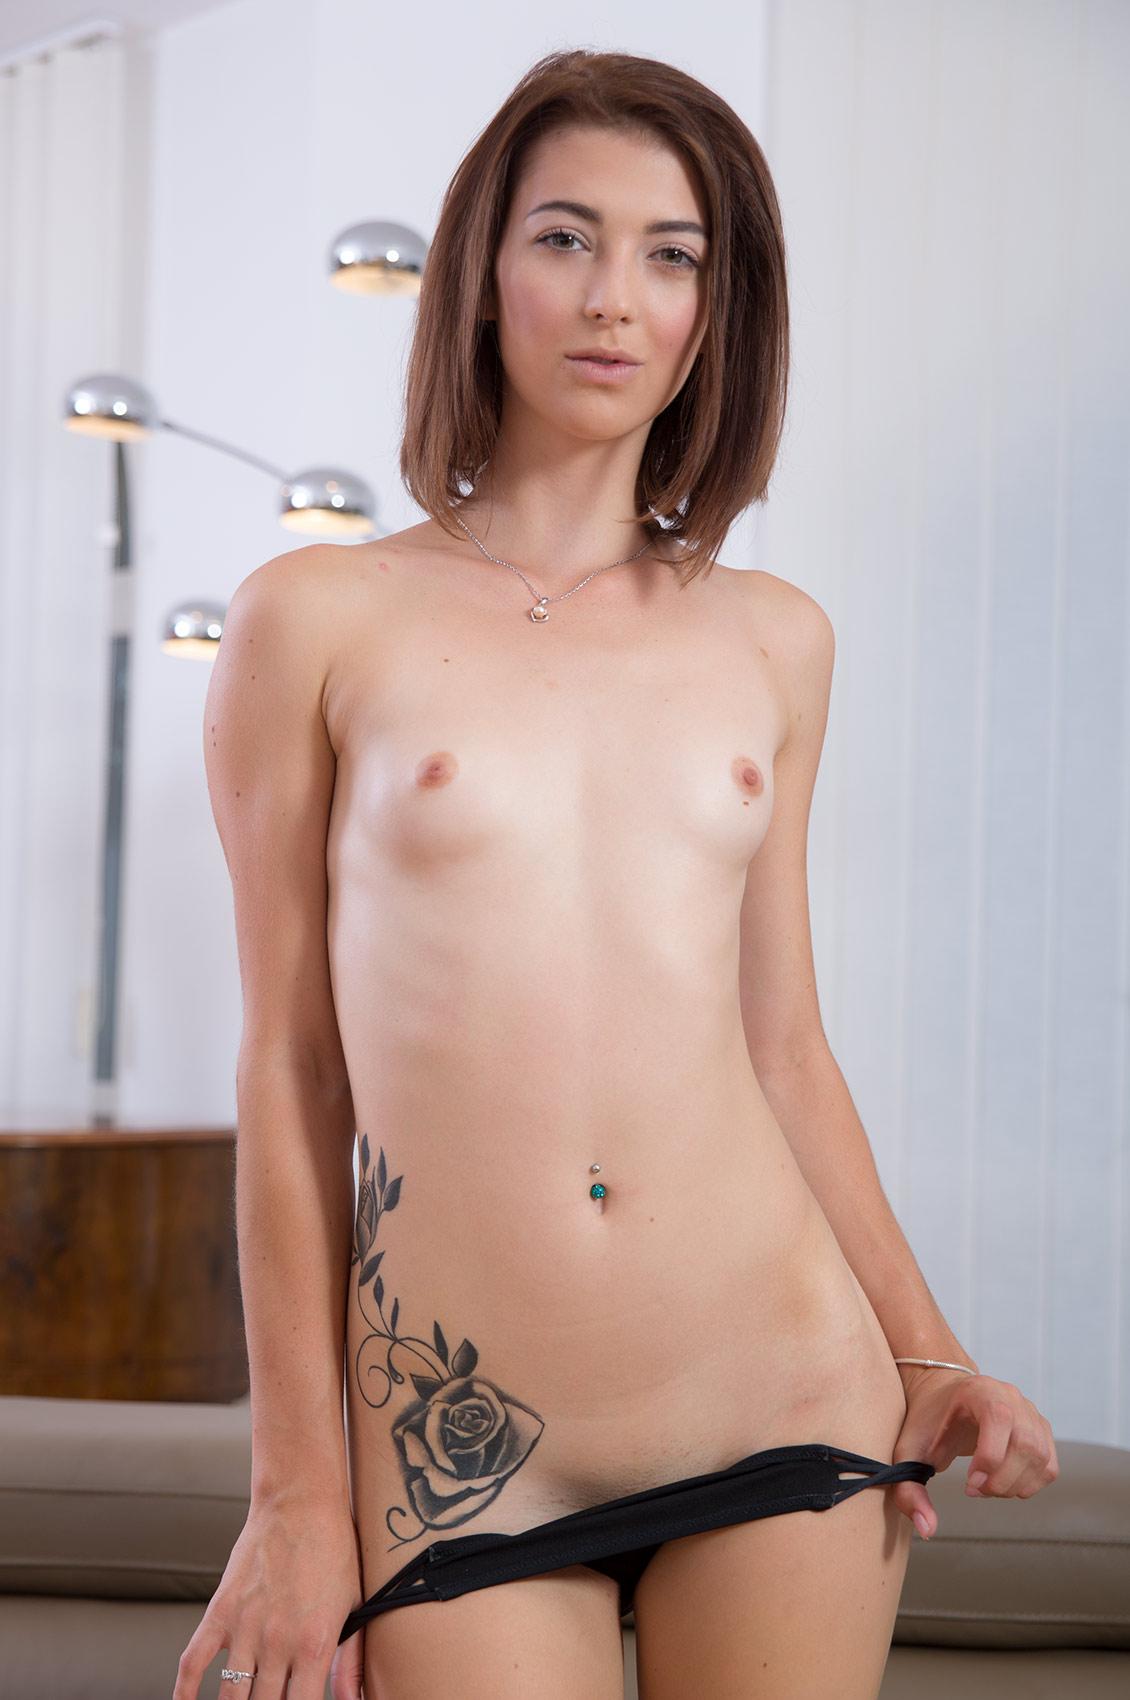 Tera Link's VR Porn Videos, Bio & Free Nude Pics